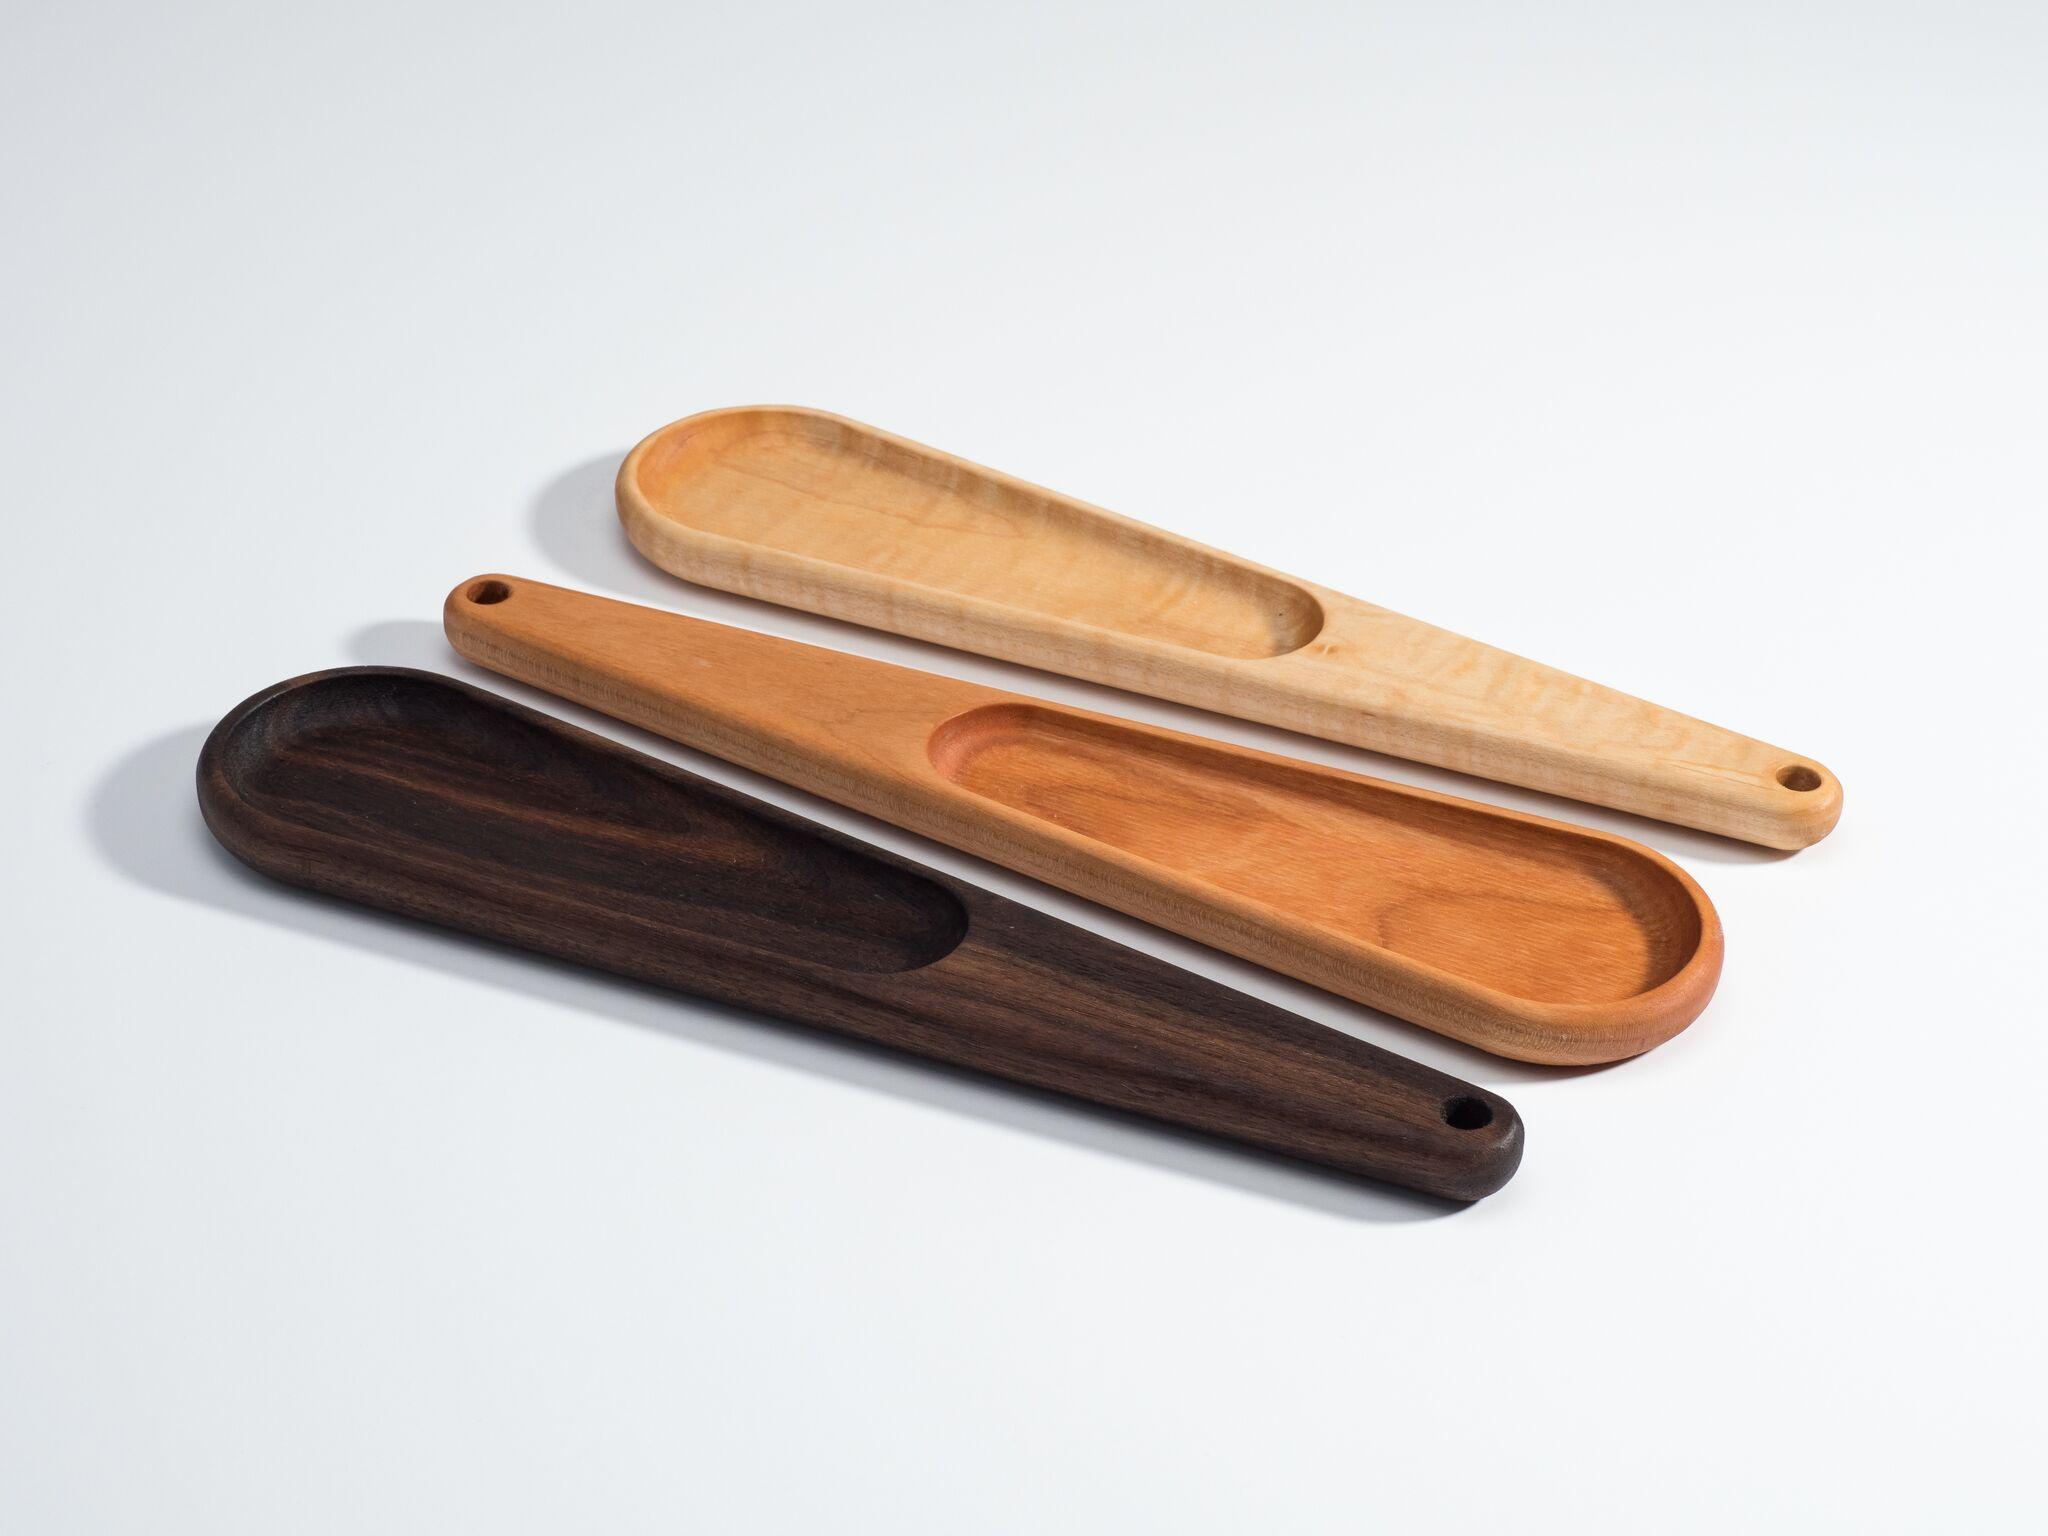 modern-wooden-spoons-maple-cherry-walnut.jpeg